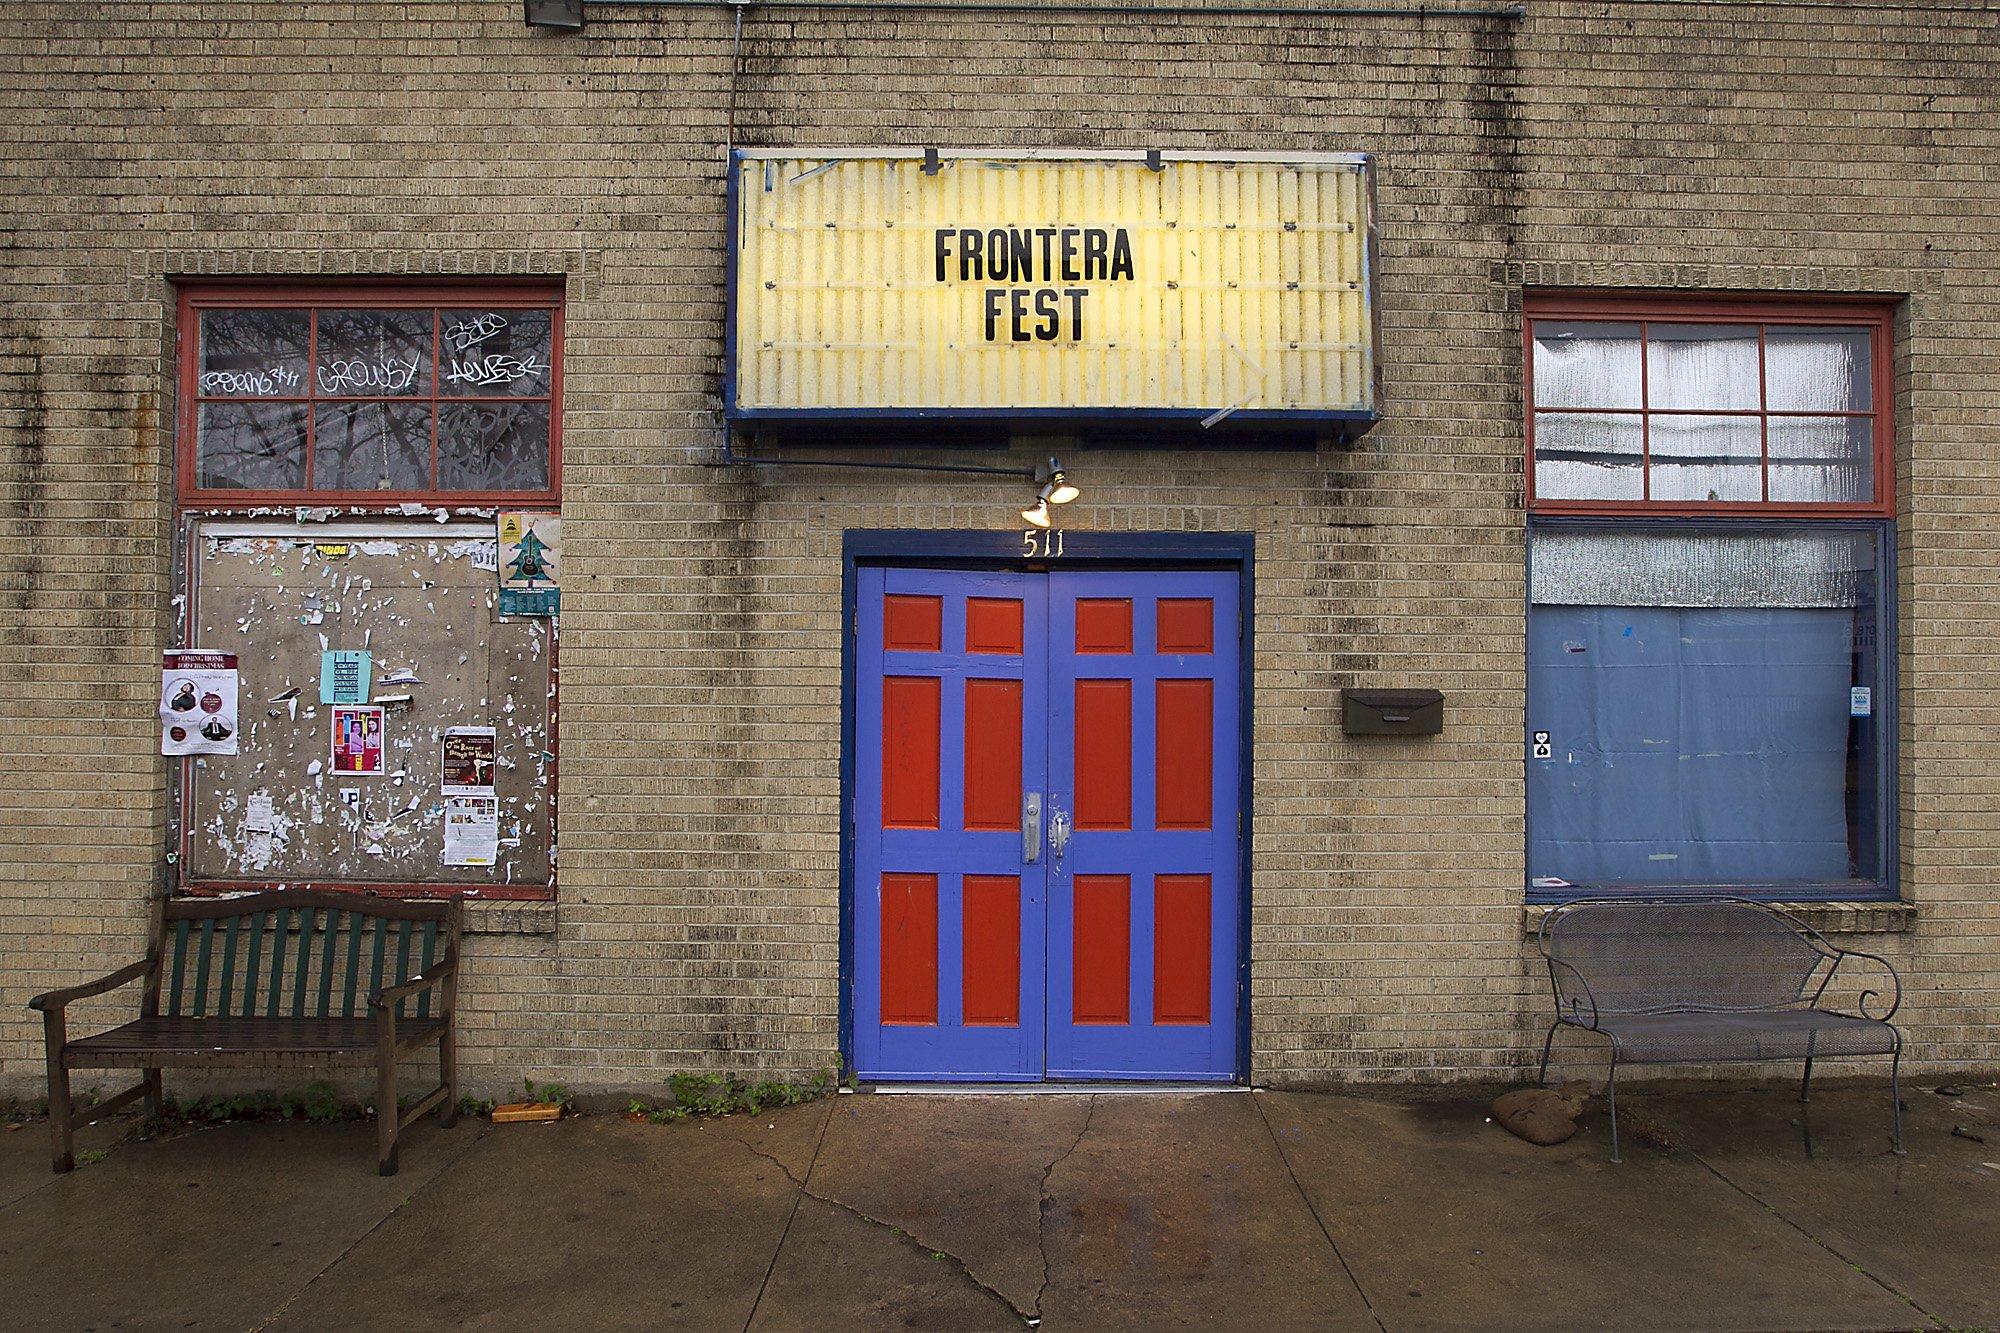 Frontera Fest - Hyde Park Theater